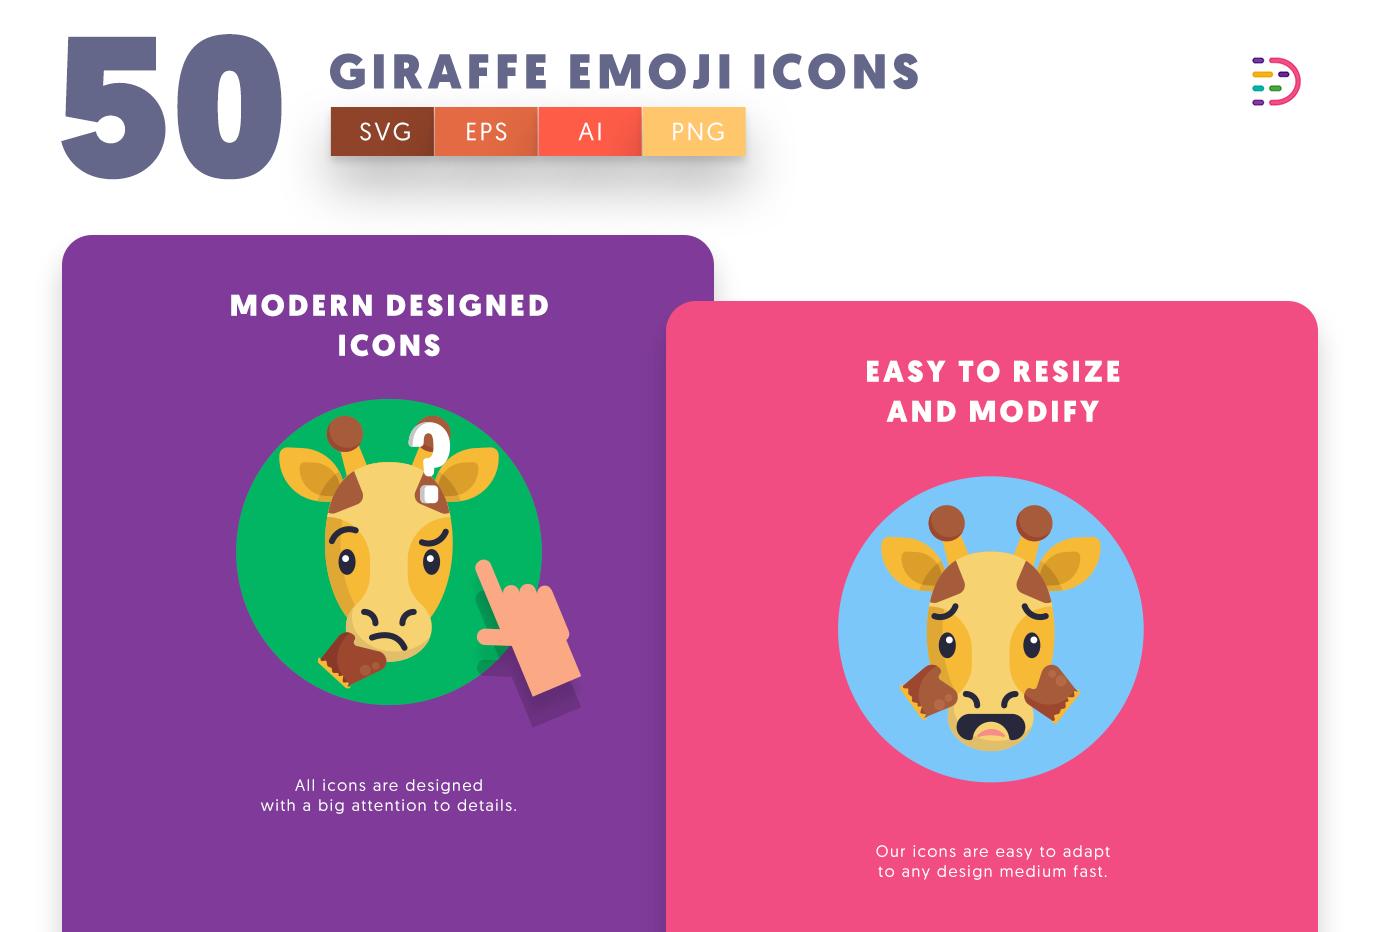 Giraffe Emoji icons png/svg/eps